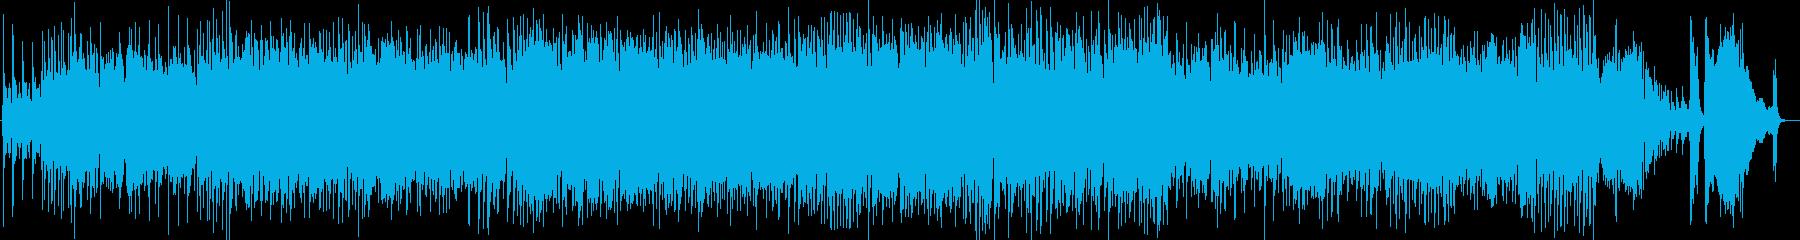 Nocturne No.2の再生済みの波形